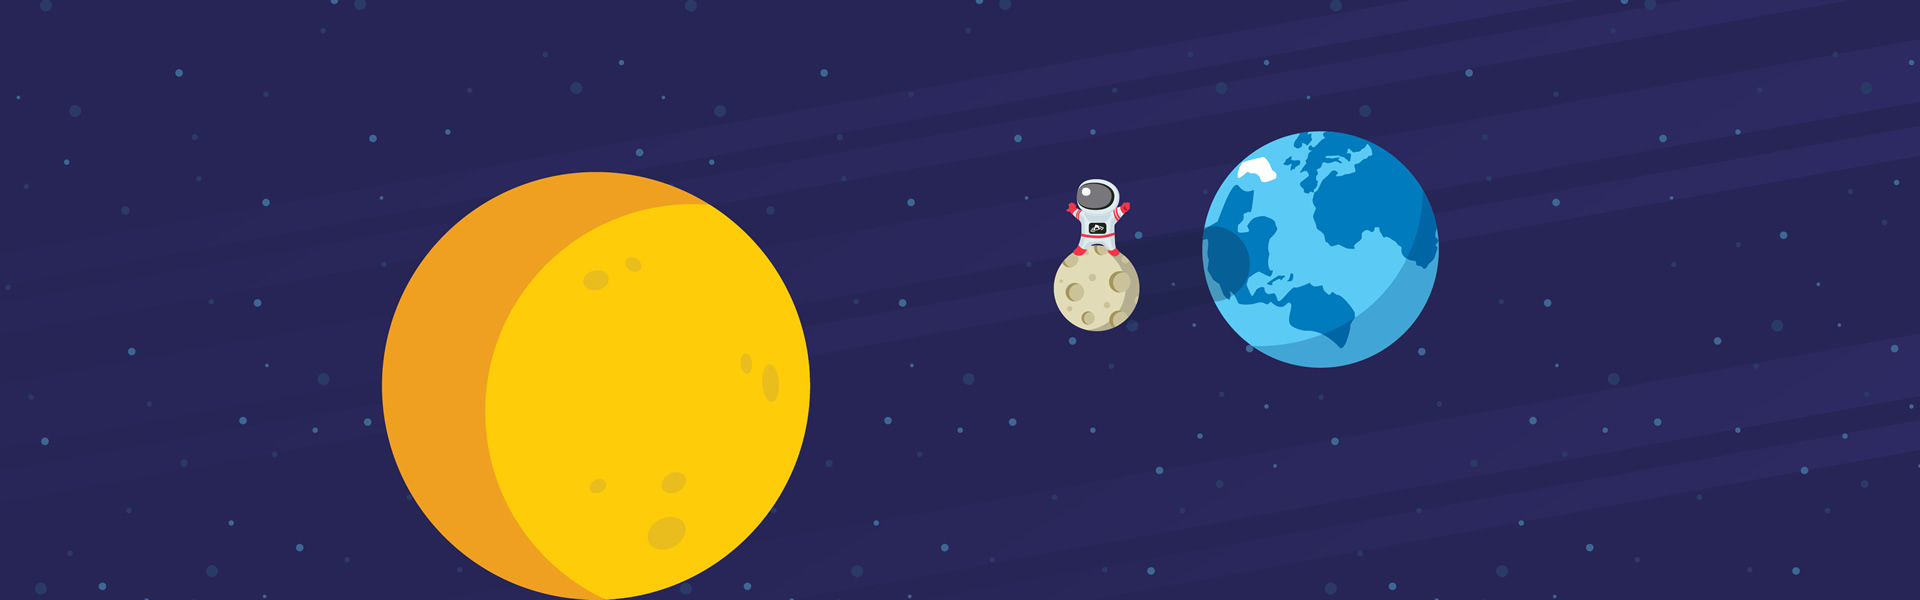 charla-eclipse2_bckg